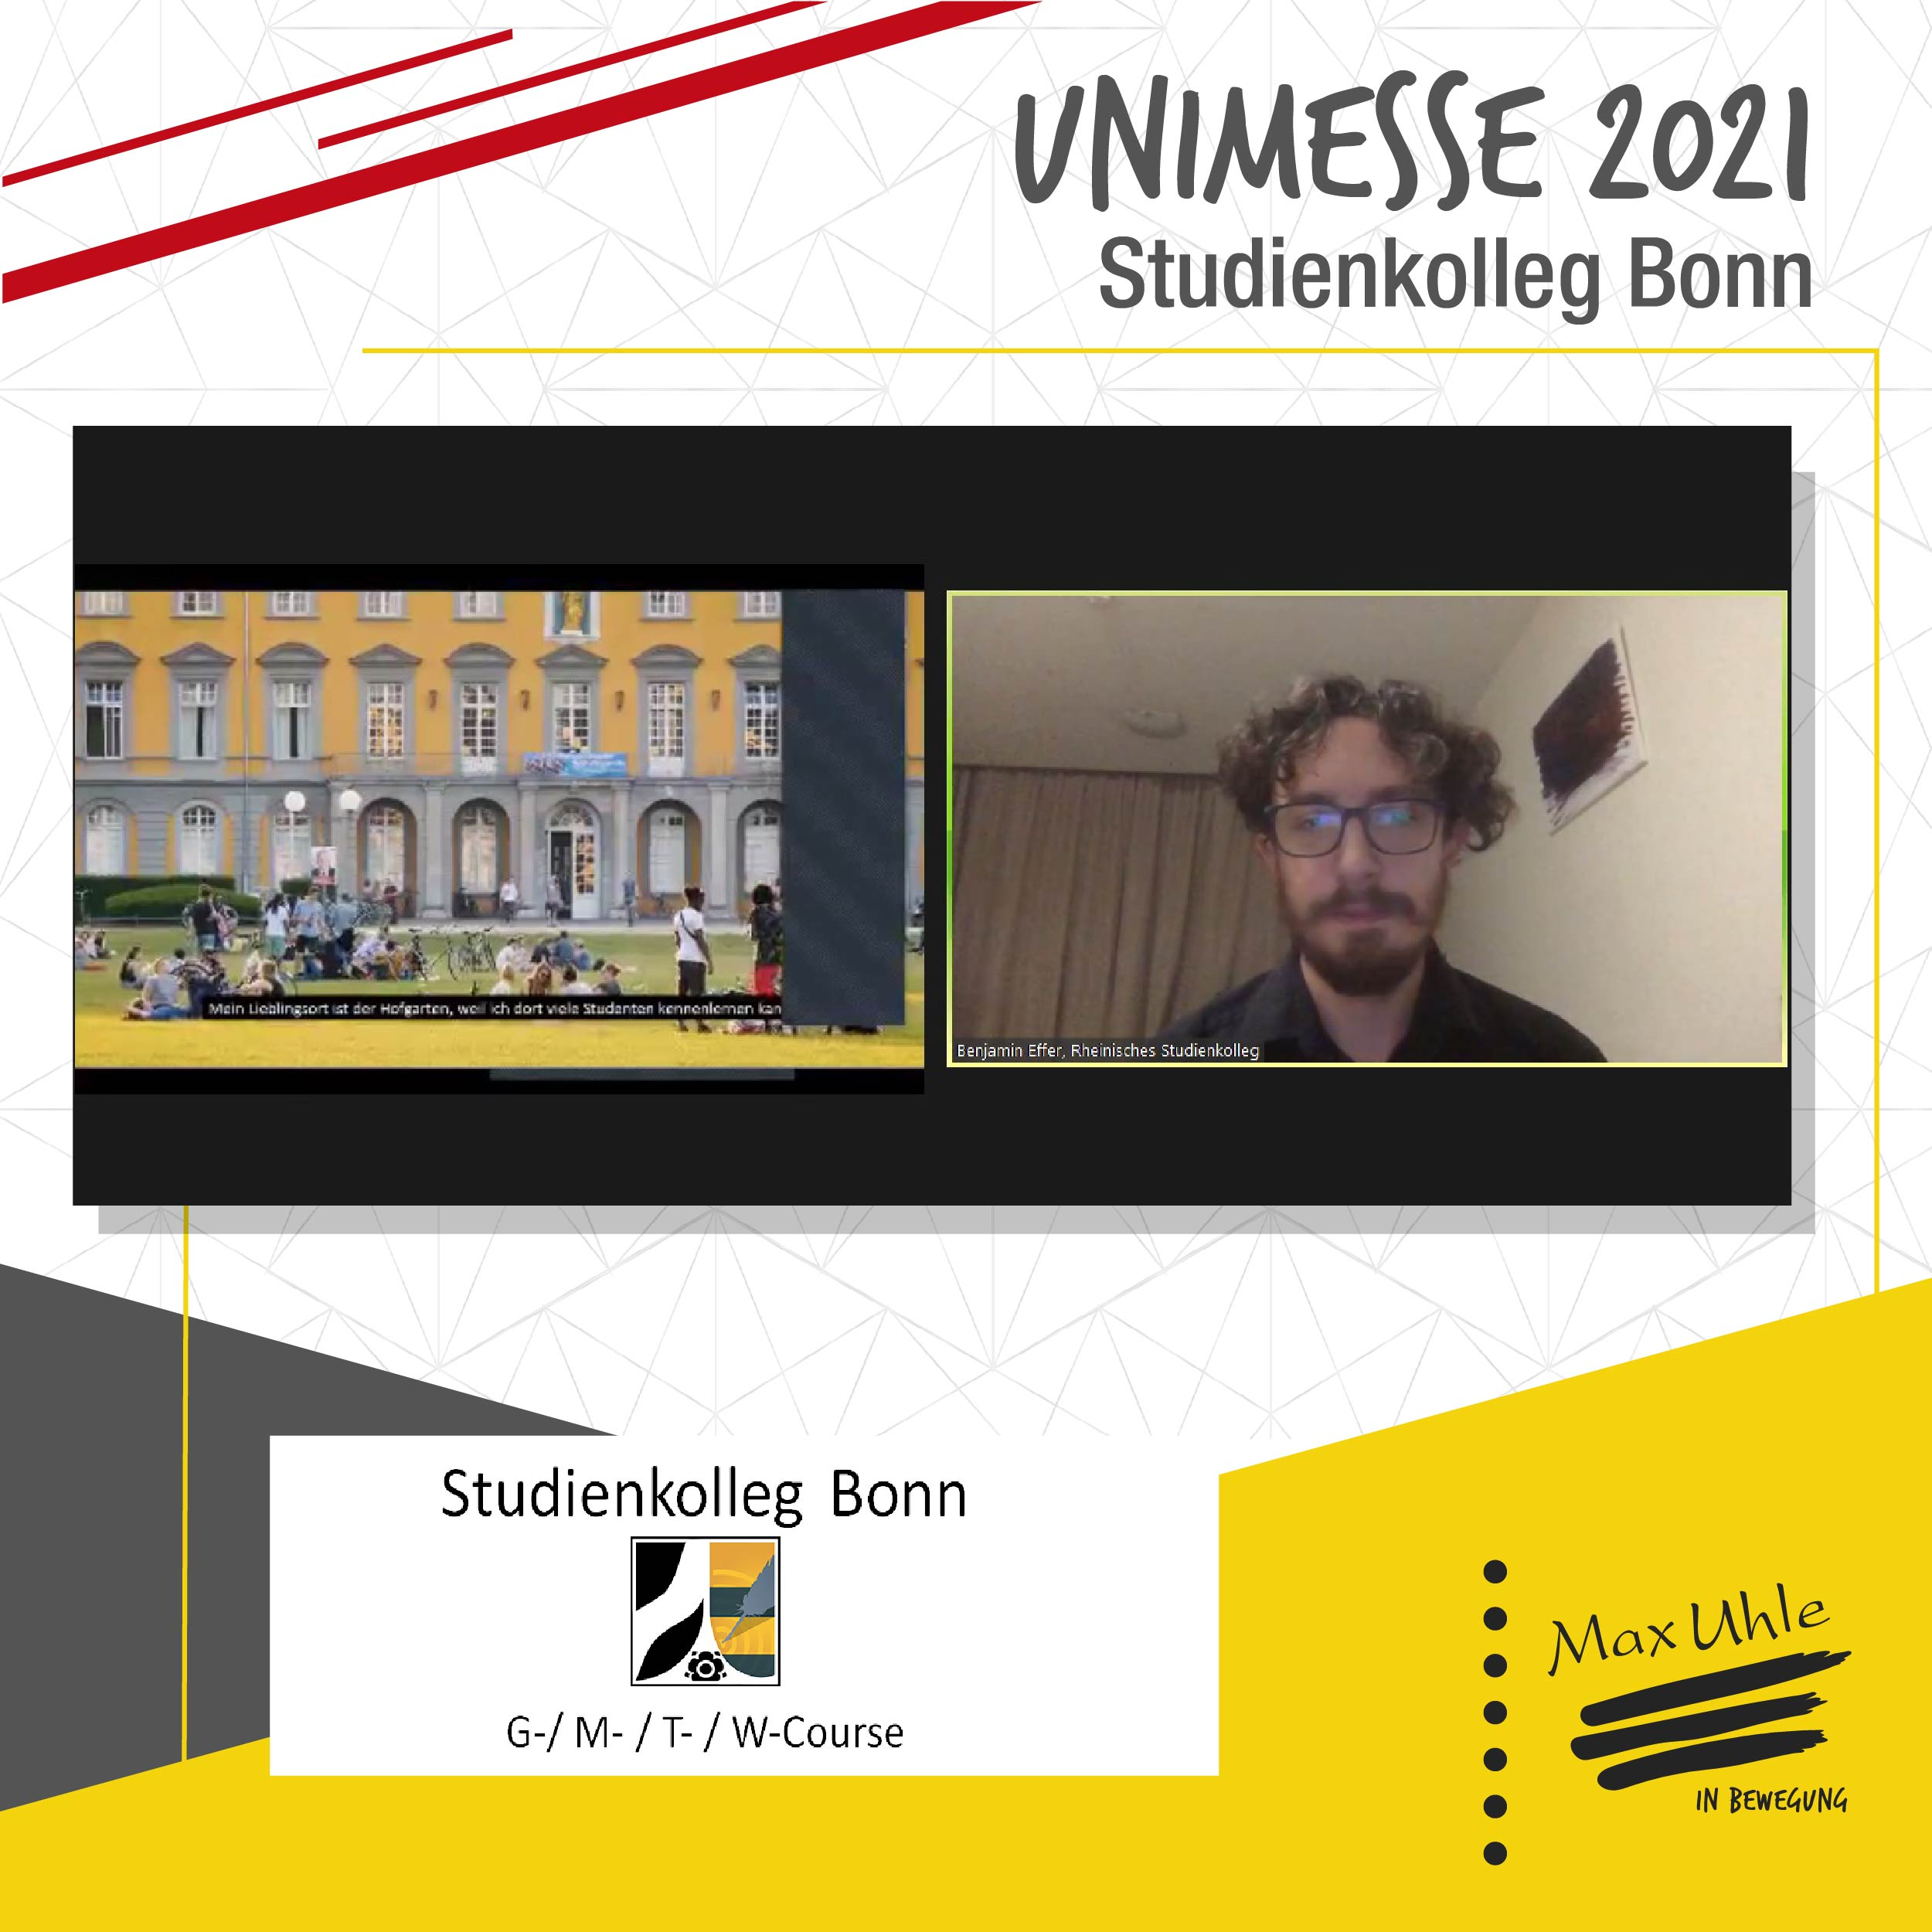 Bonn - Unimesse 2021 Colegio Max Uhle